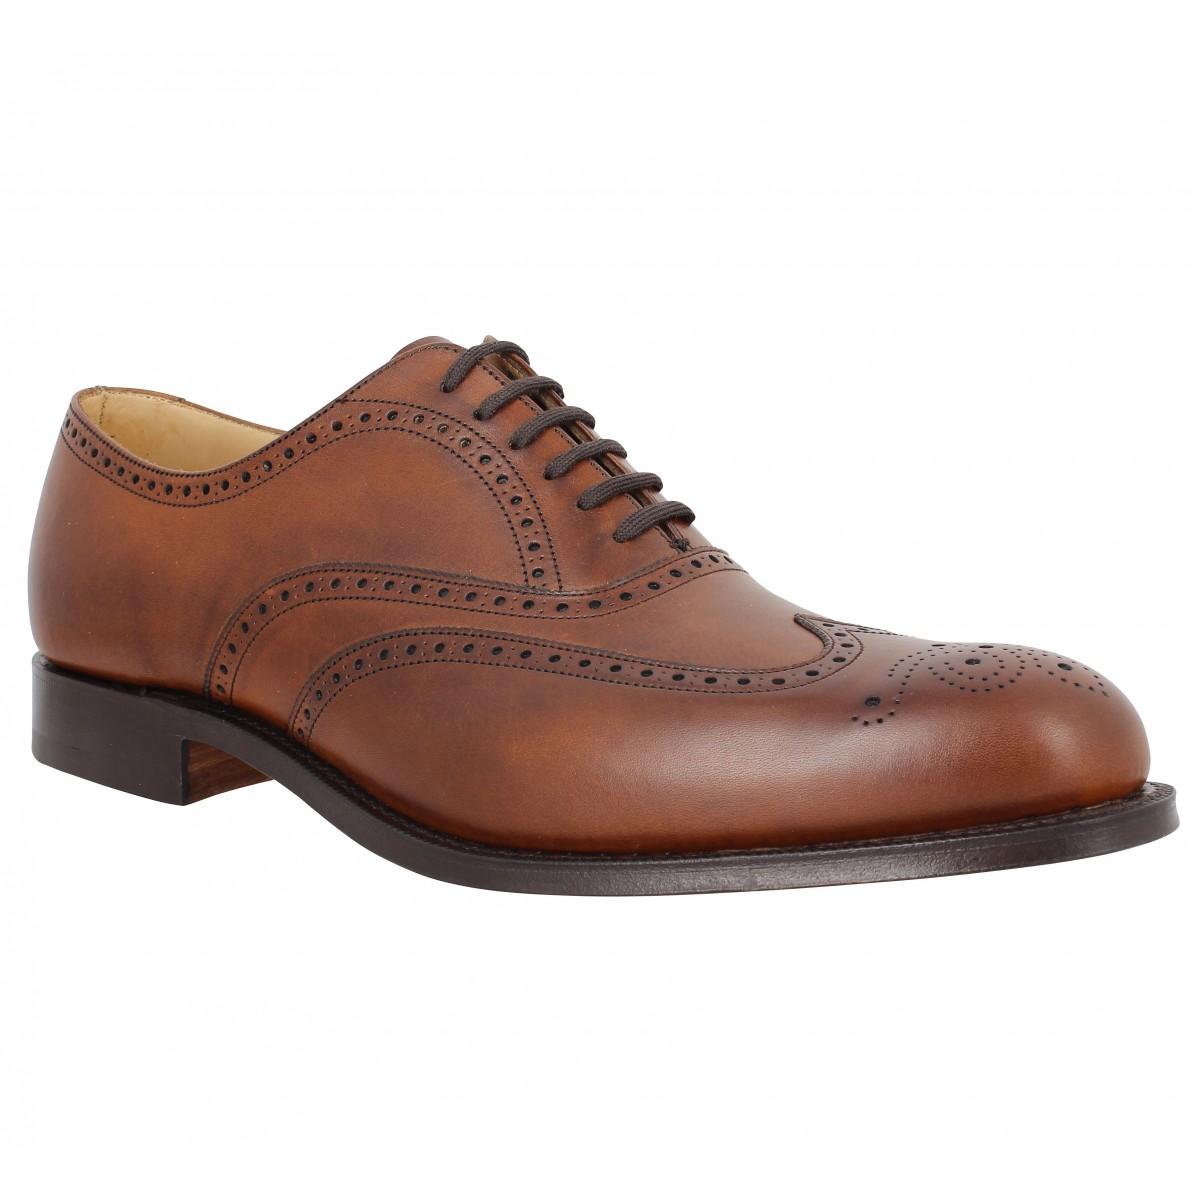 Chaussures à lacets CHURCH'S Berlin cuir Walnut